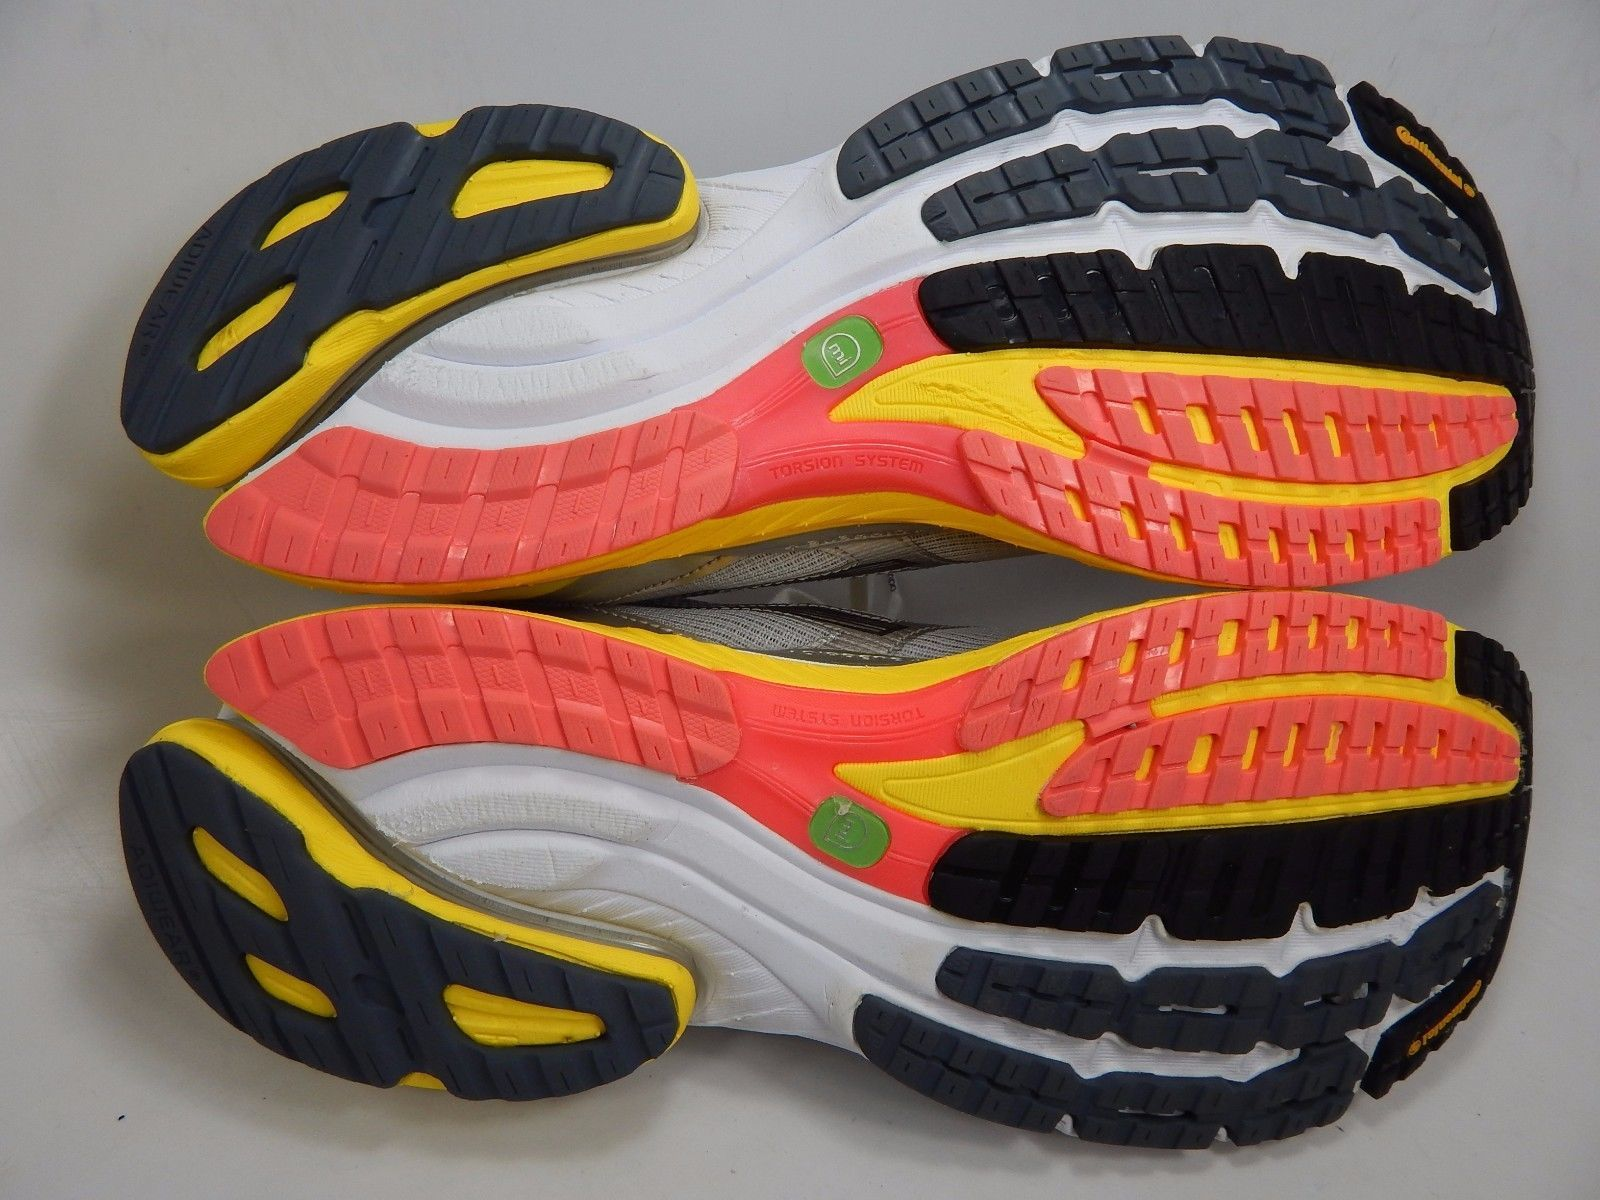 Adidas AdiZero Aegis 3 Women's Running Shoes Size US 10.5 M (B) EU 43 1/3 Silver